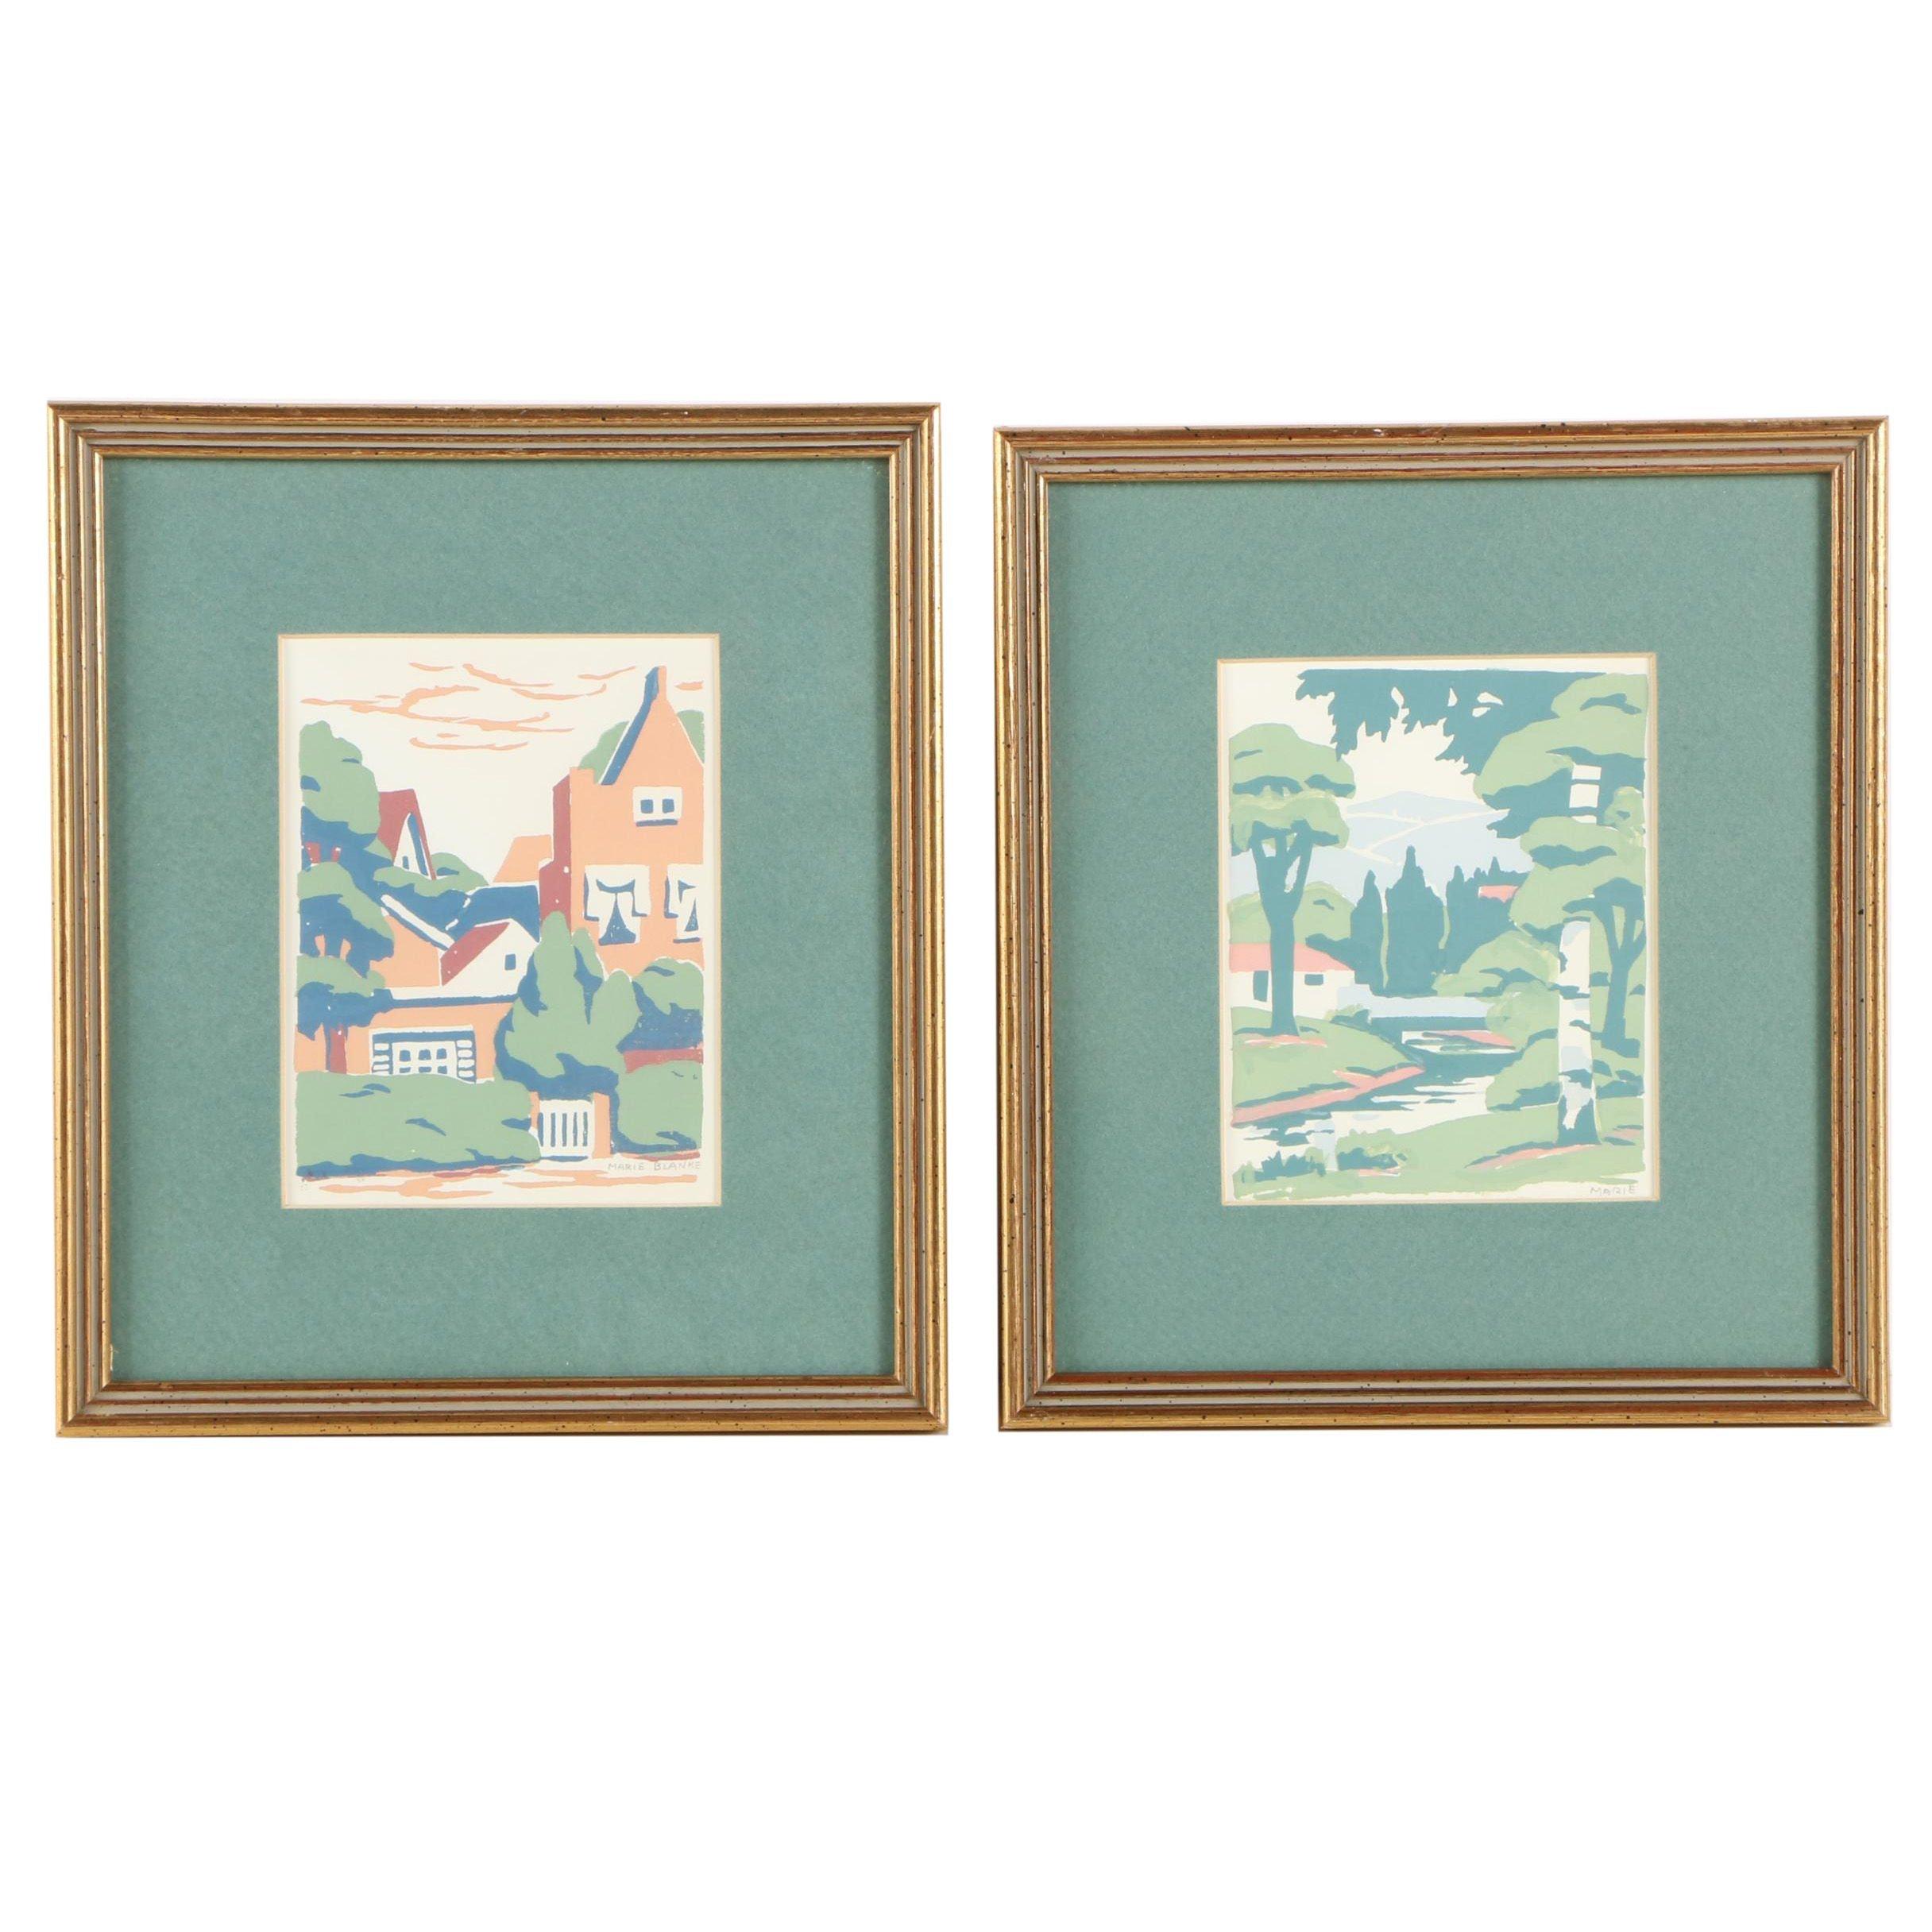 Marie Blanke Serigraph Prints on Paper